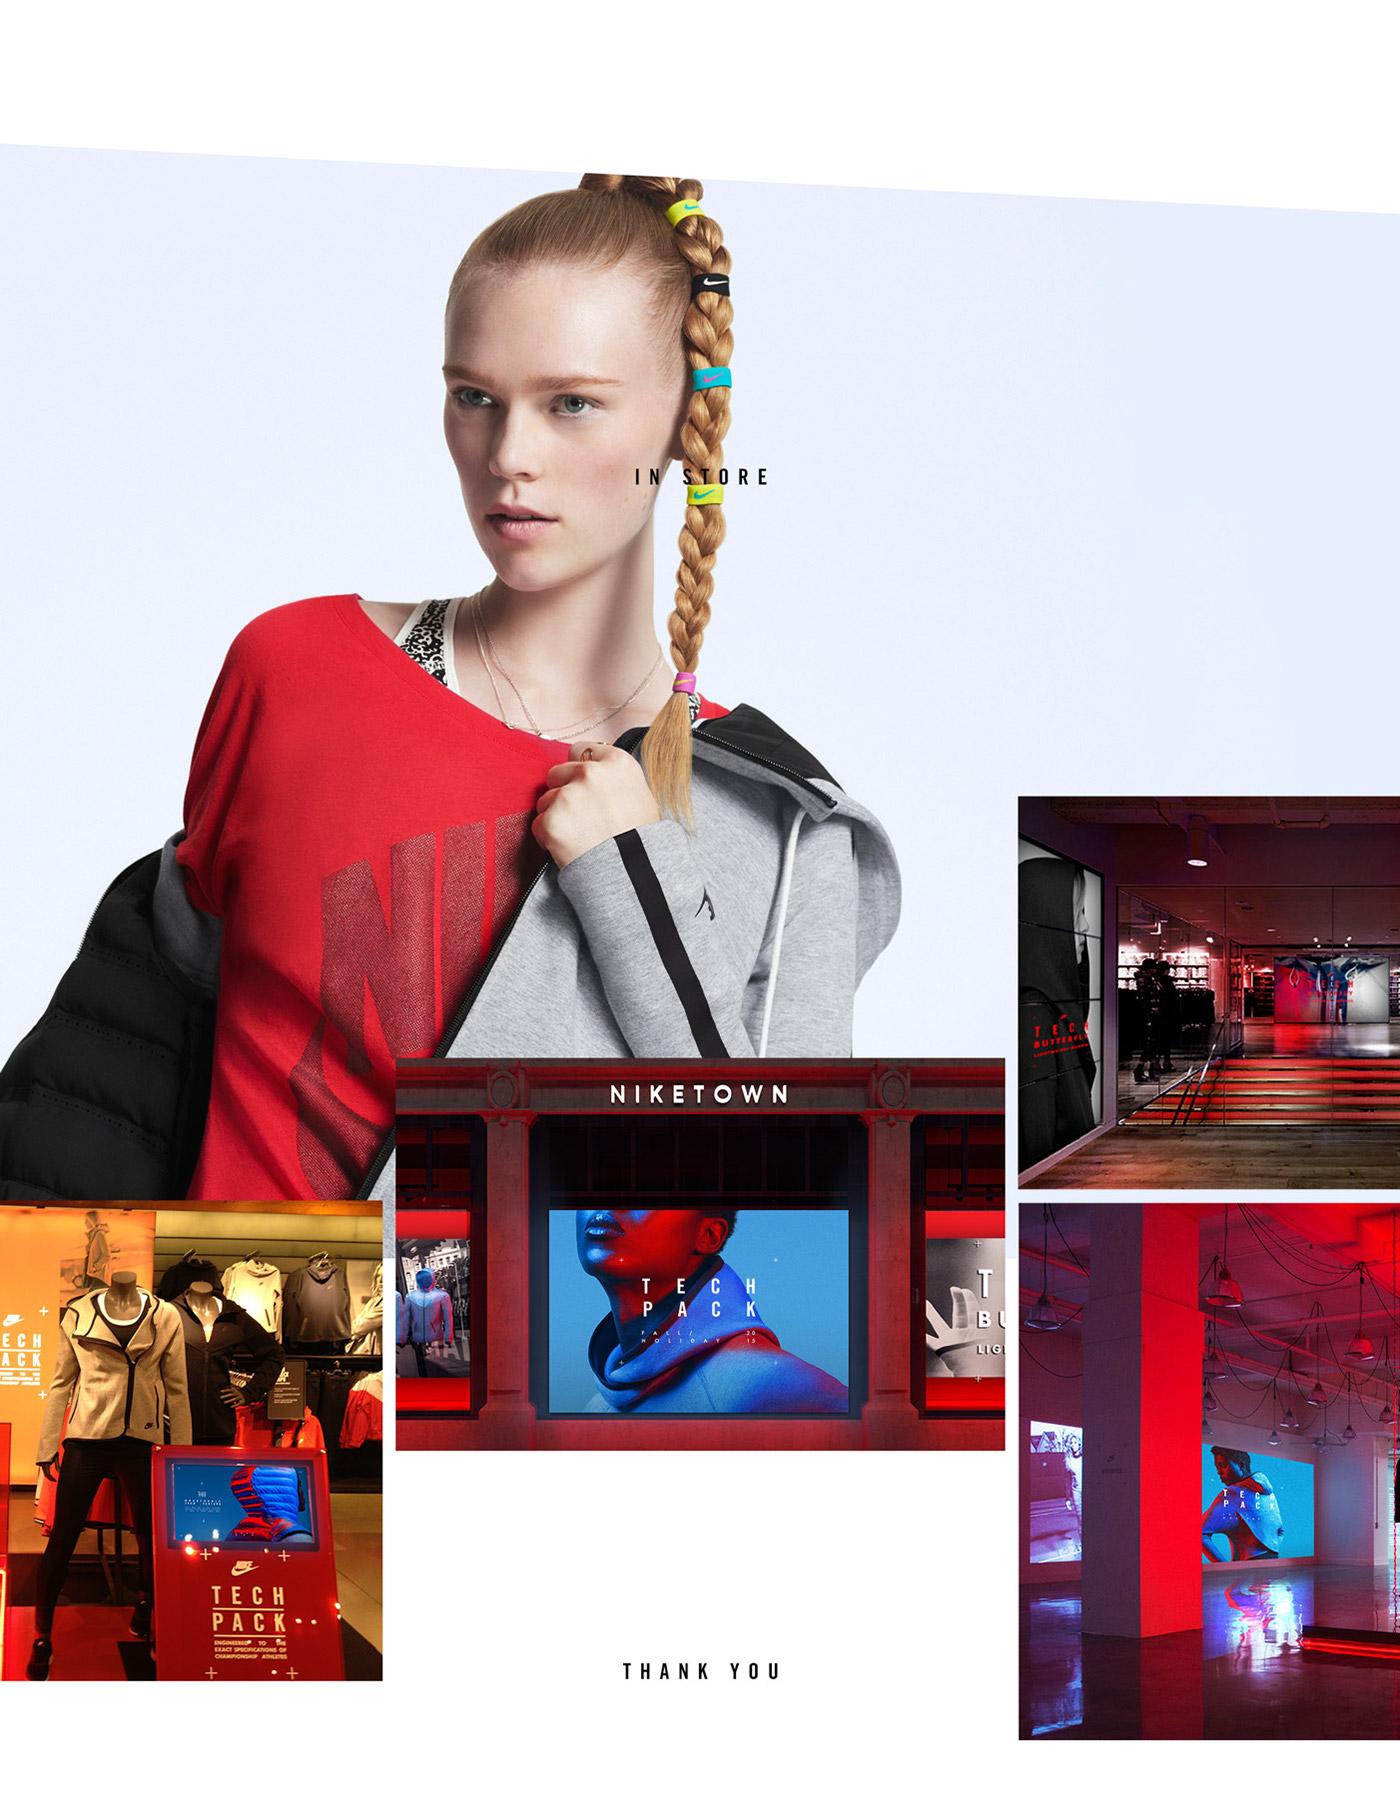 Nike app flat color tech Pack UI minimal iPad installation experimental look sport book Layout